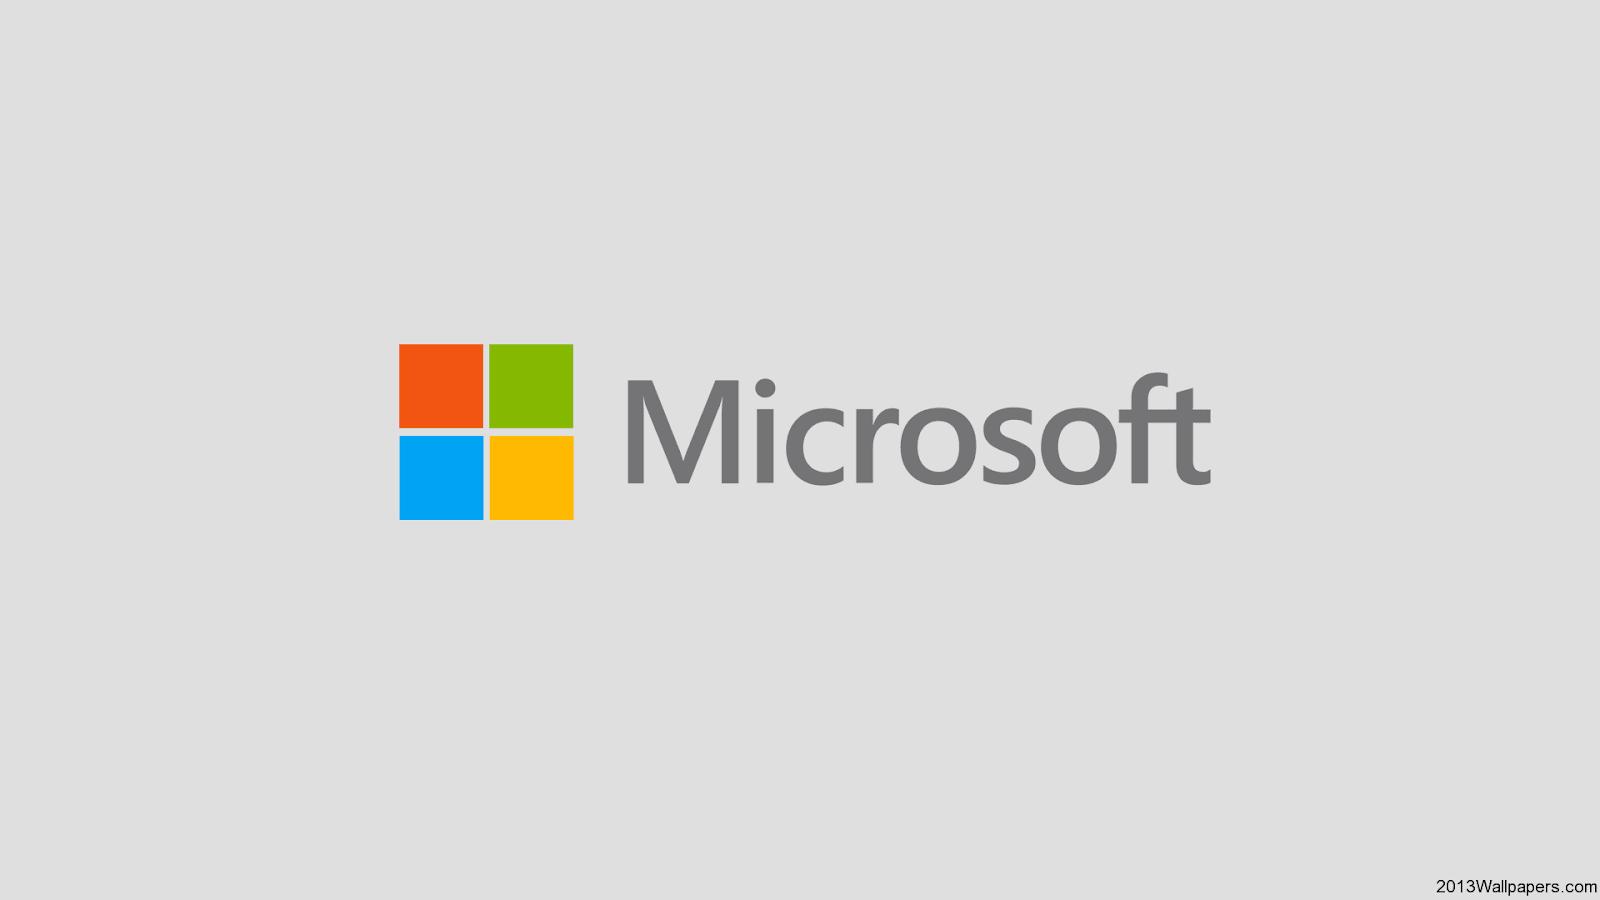 Microsoft Logo Wallpapers - Top Free Microsoft Logo Backgrounds ...